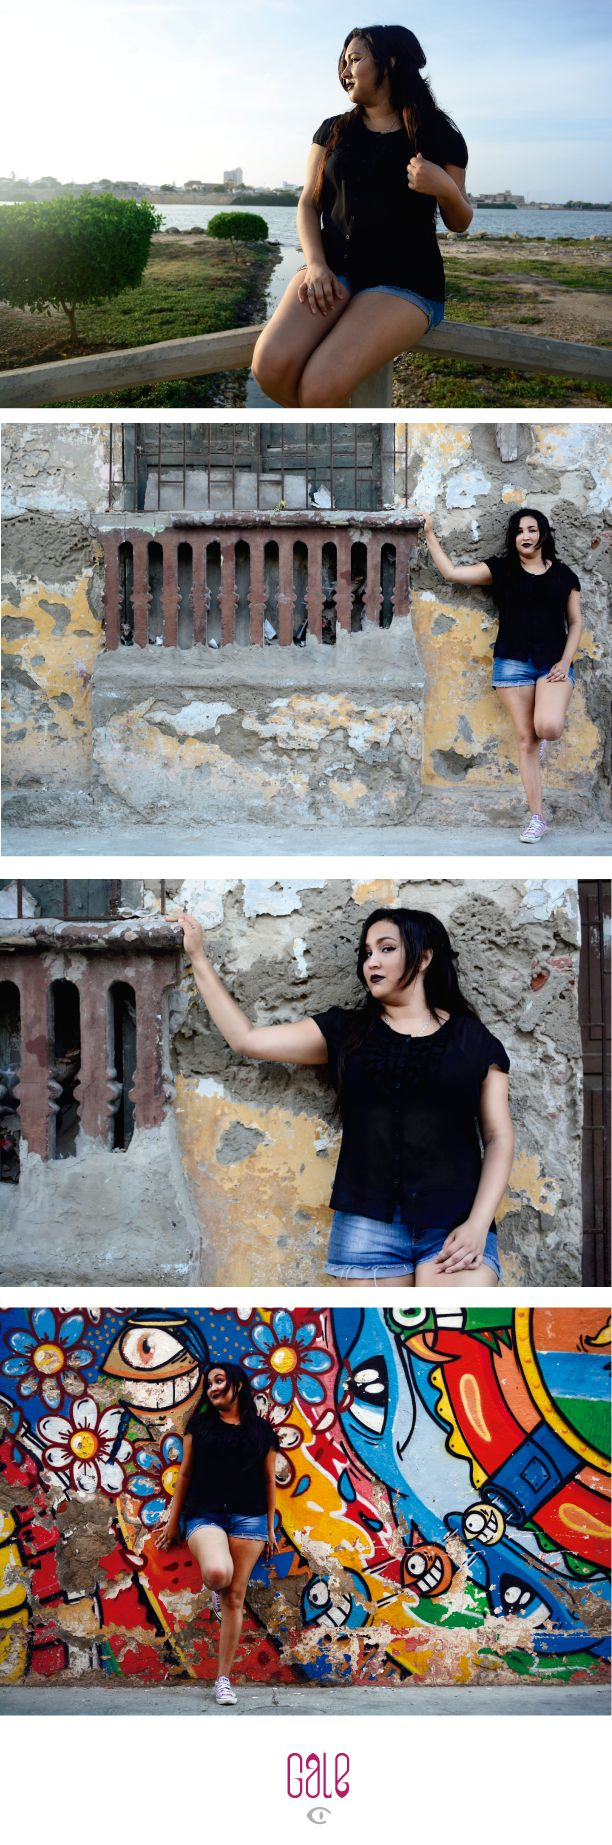 Alexandra Romero Barrios on Behance